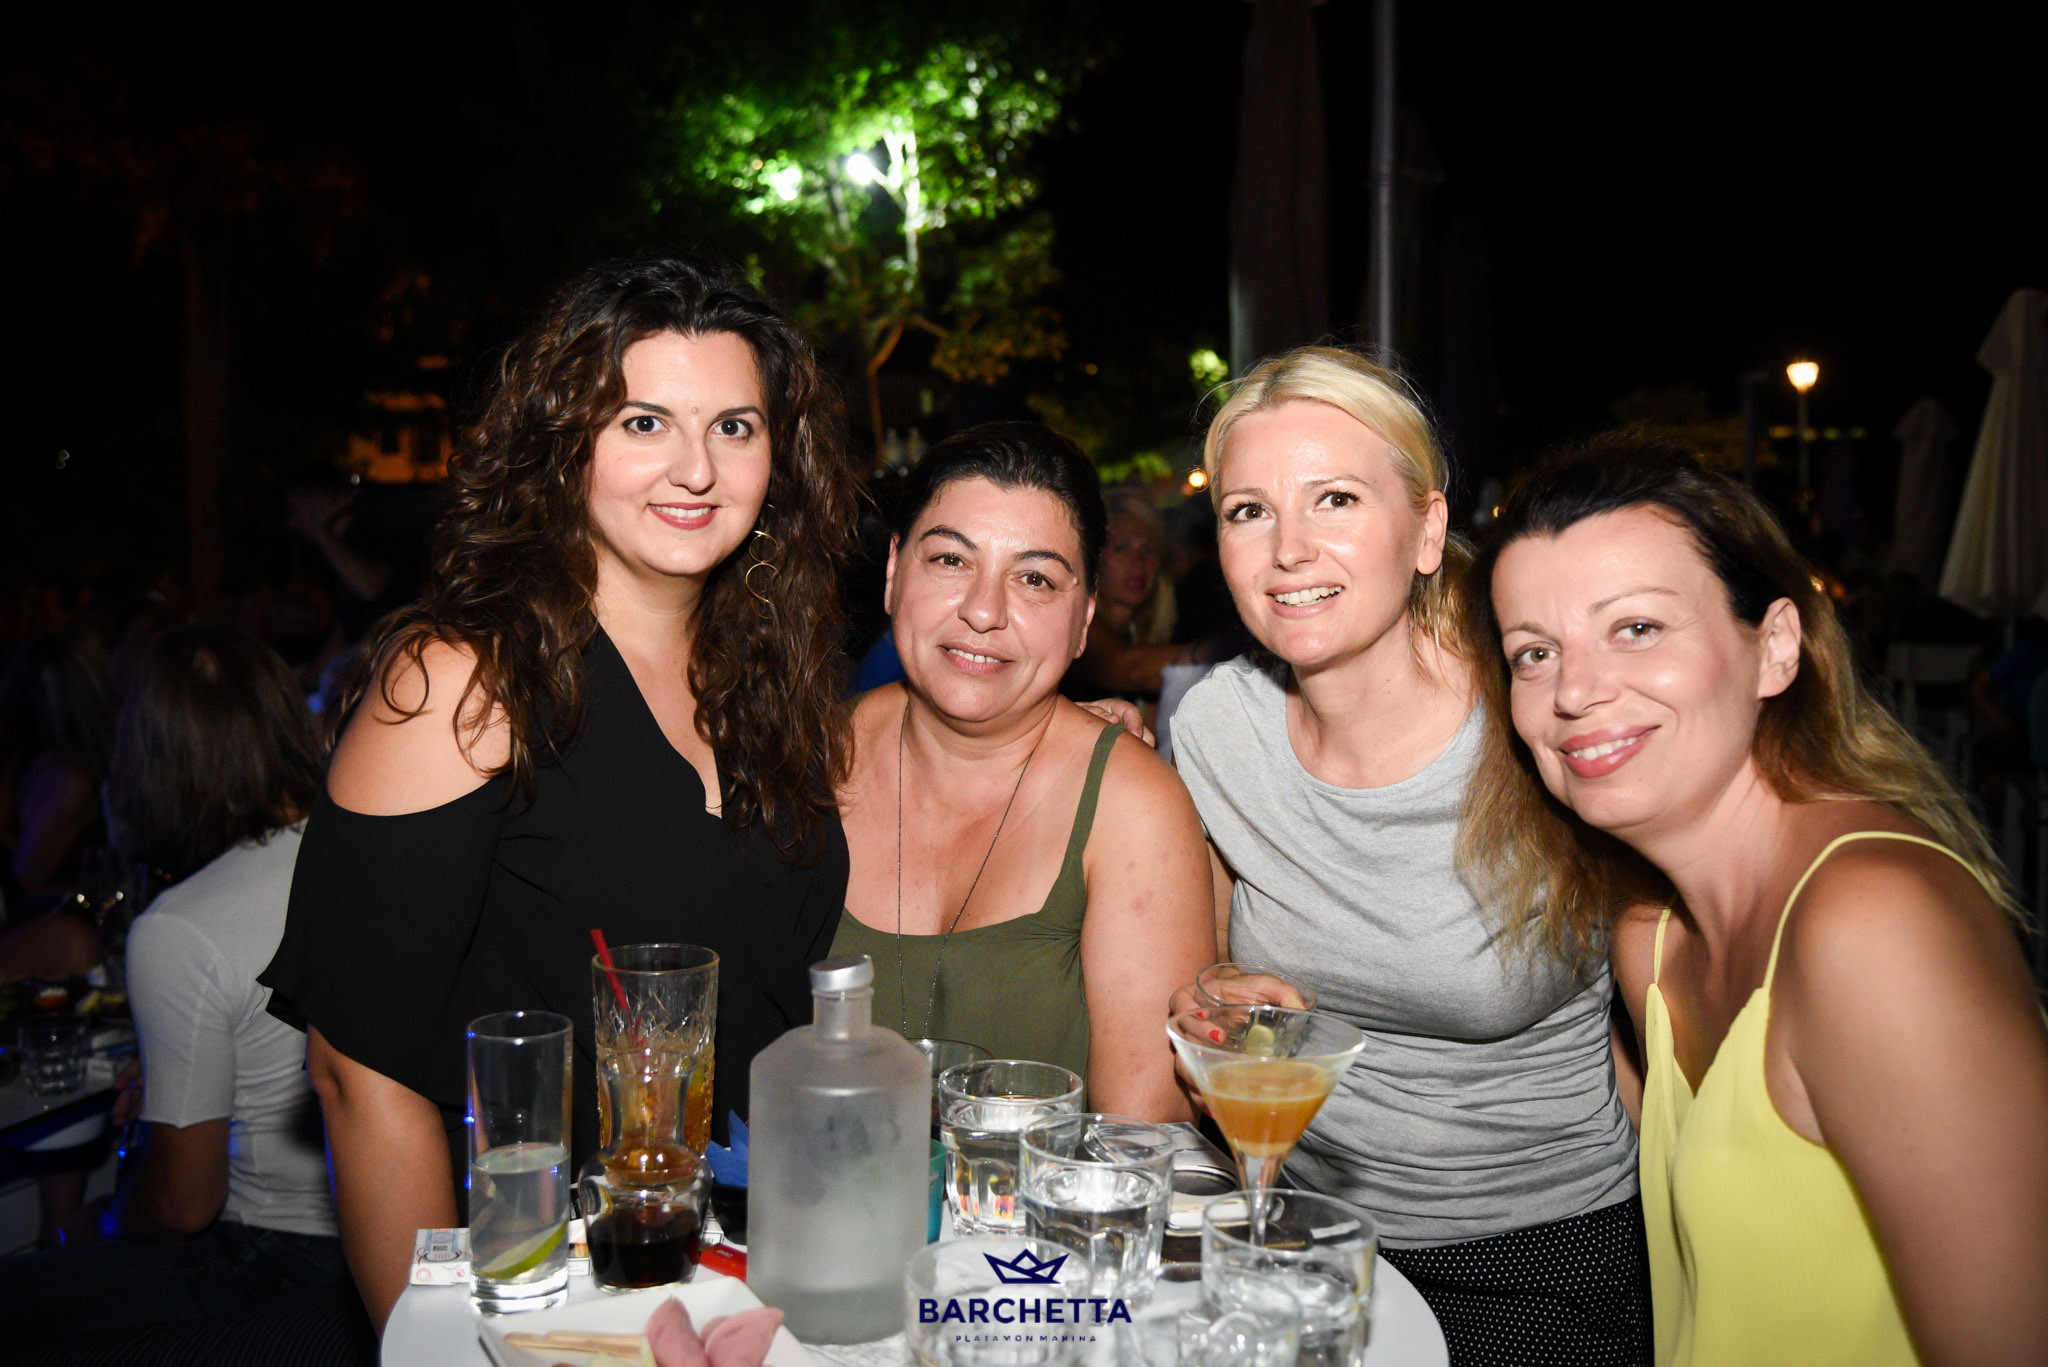 DSC 7285 1 - Barchetta | Σάββατο 5.8.2017